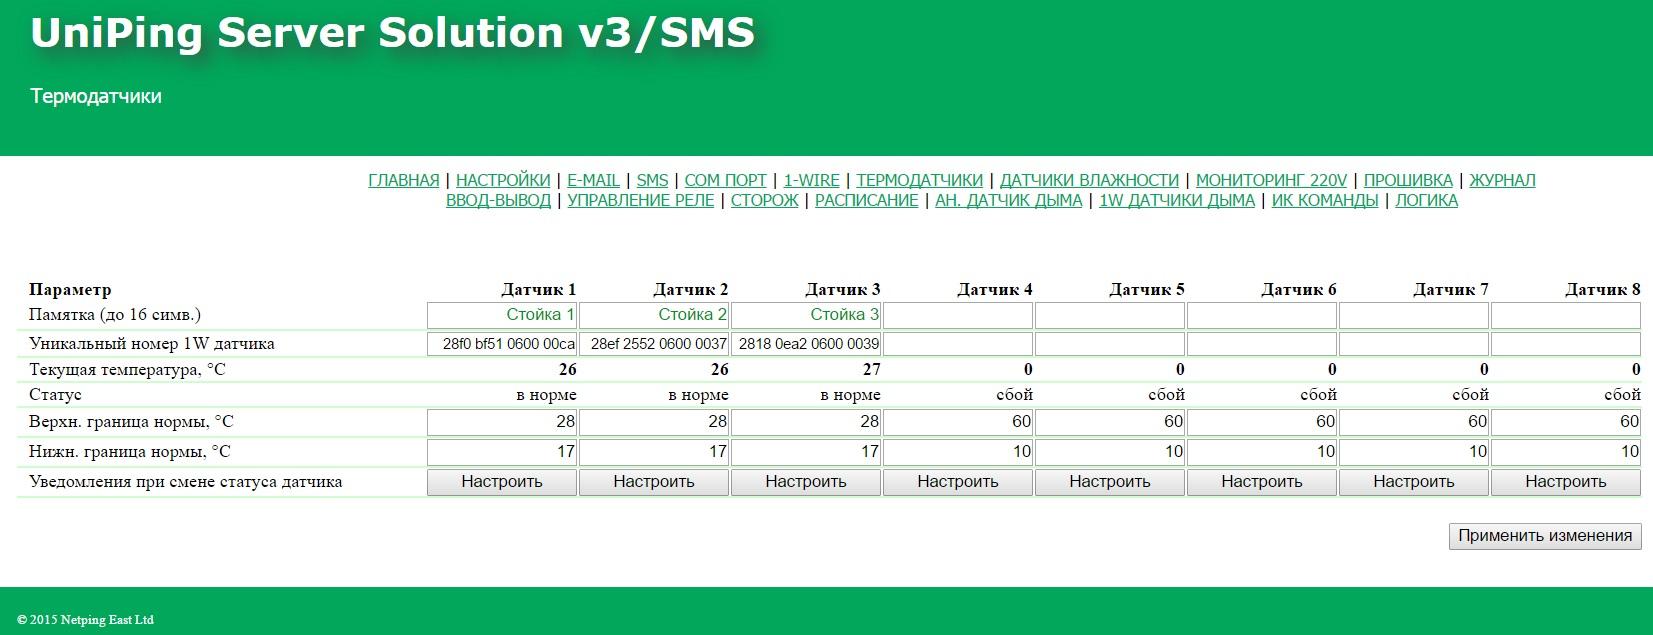 Мониторинг температуры в web-интерфейсе UniPing server solution v3SMS